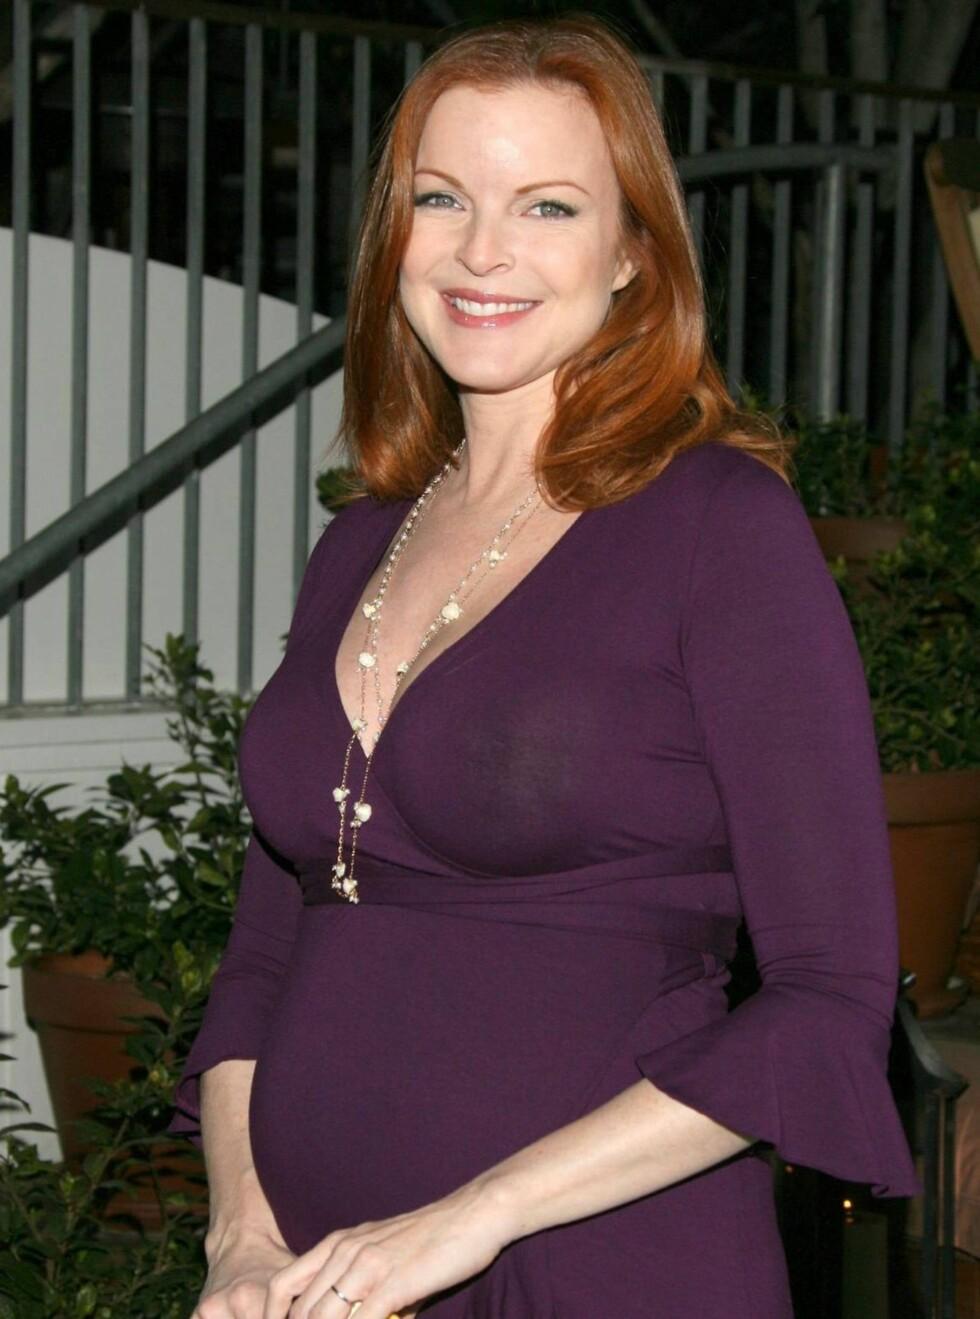 BLIR PASSET PÅ: Marcia Cross med voksende mage snaue fire måneder før fødselen... Foto: All Over Press